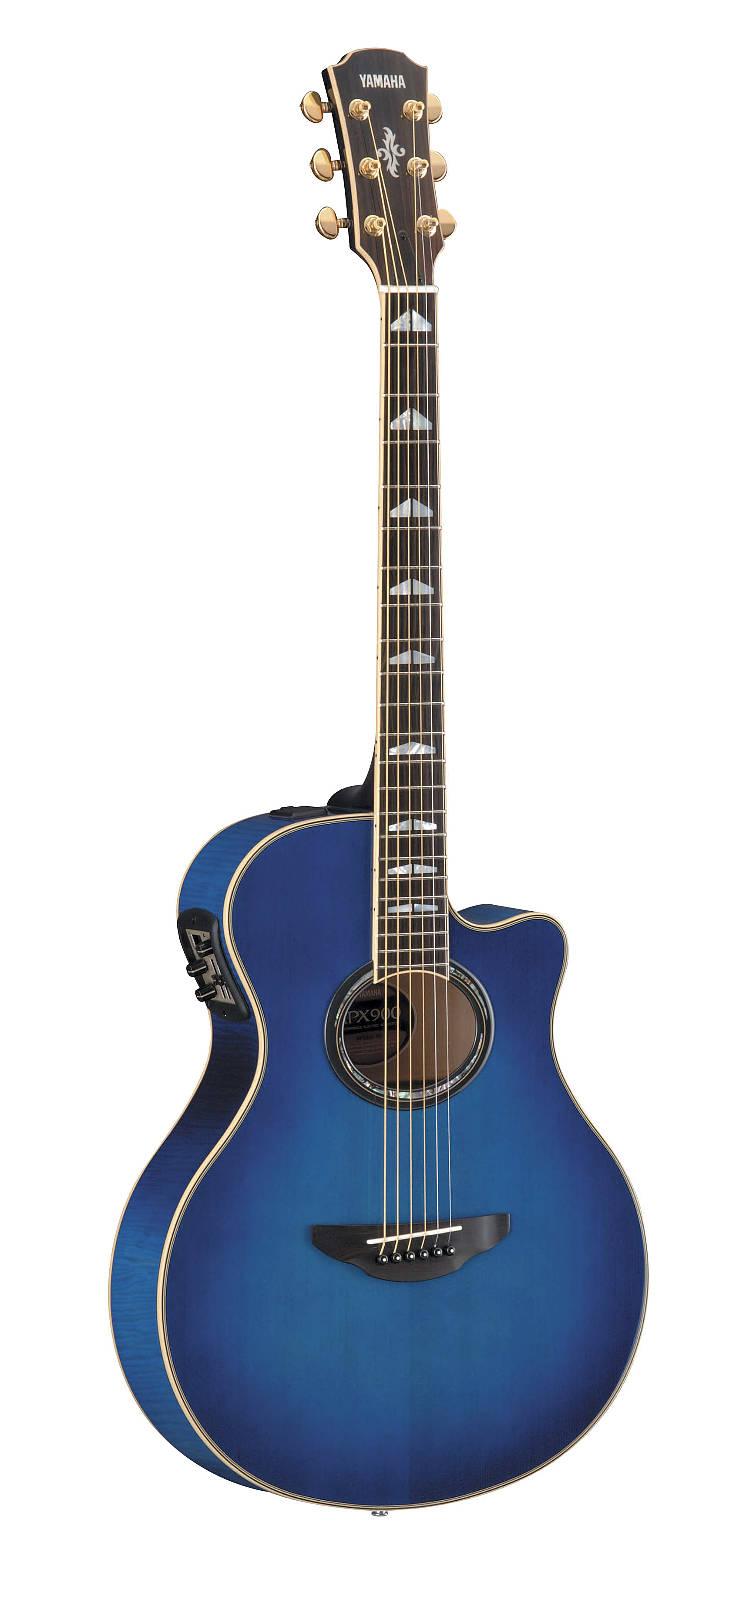 yamaha apx 900 um elektro akustik gitarre ultramarine. Black Bedroom Furniture Sets. Home Design Ideas